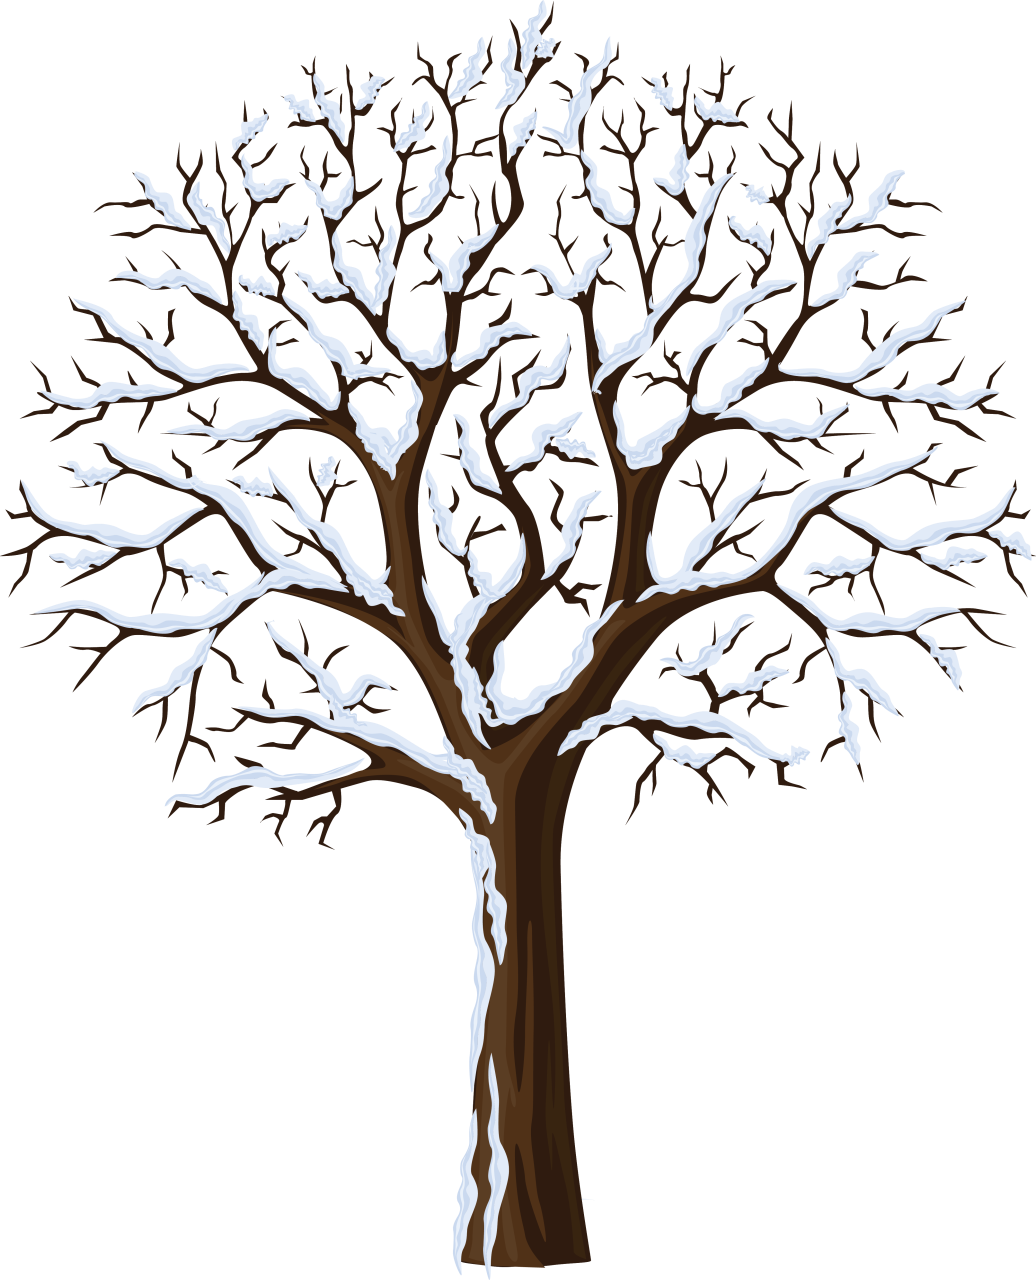 http://foxarc.com/c-blog/wp-content/uploads/2014/12/Tree ...